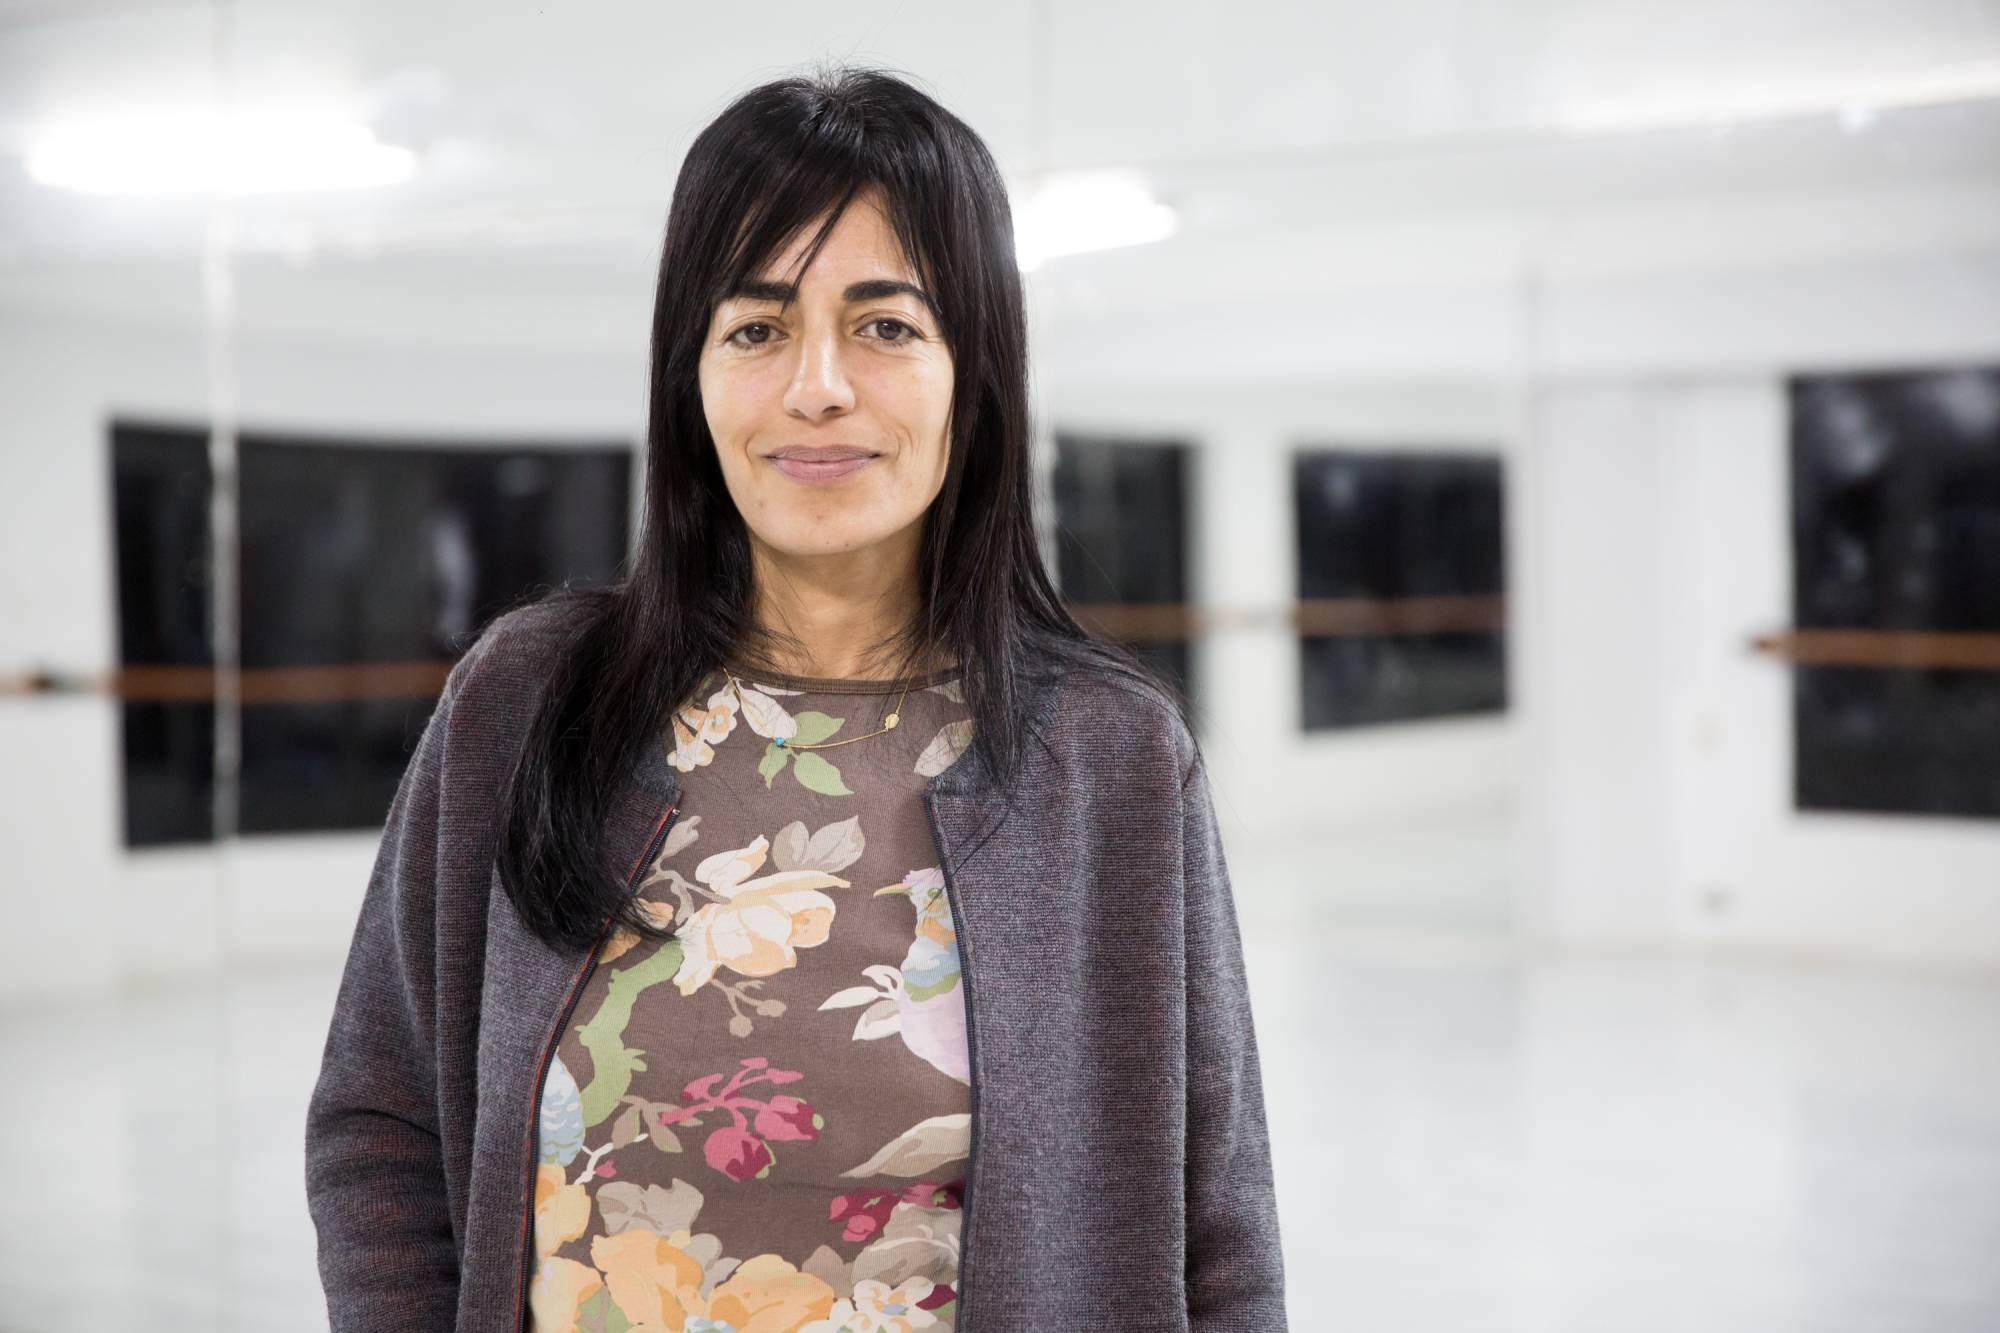 Karima Mansour, Cairo, 2018 (Image: Mostafa Abdel Aty)